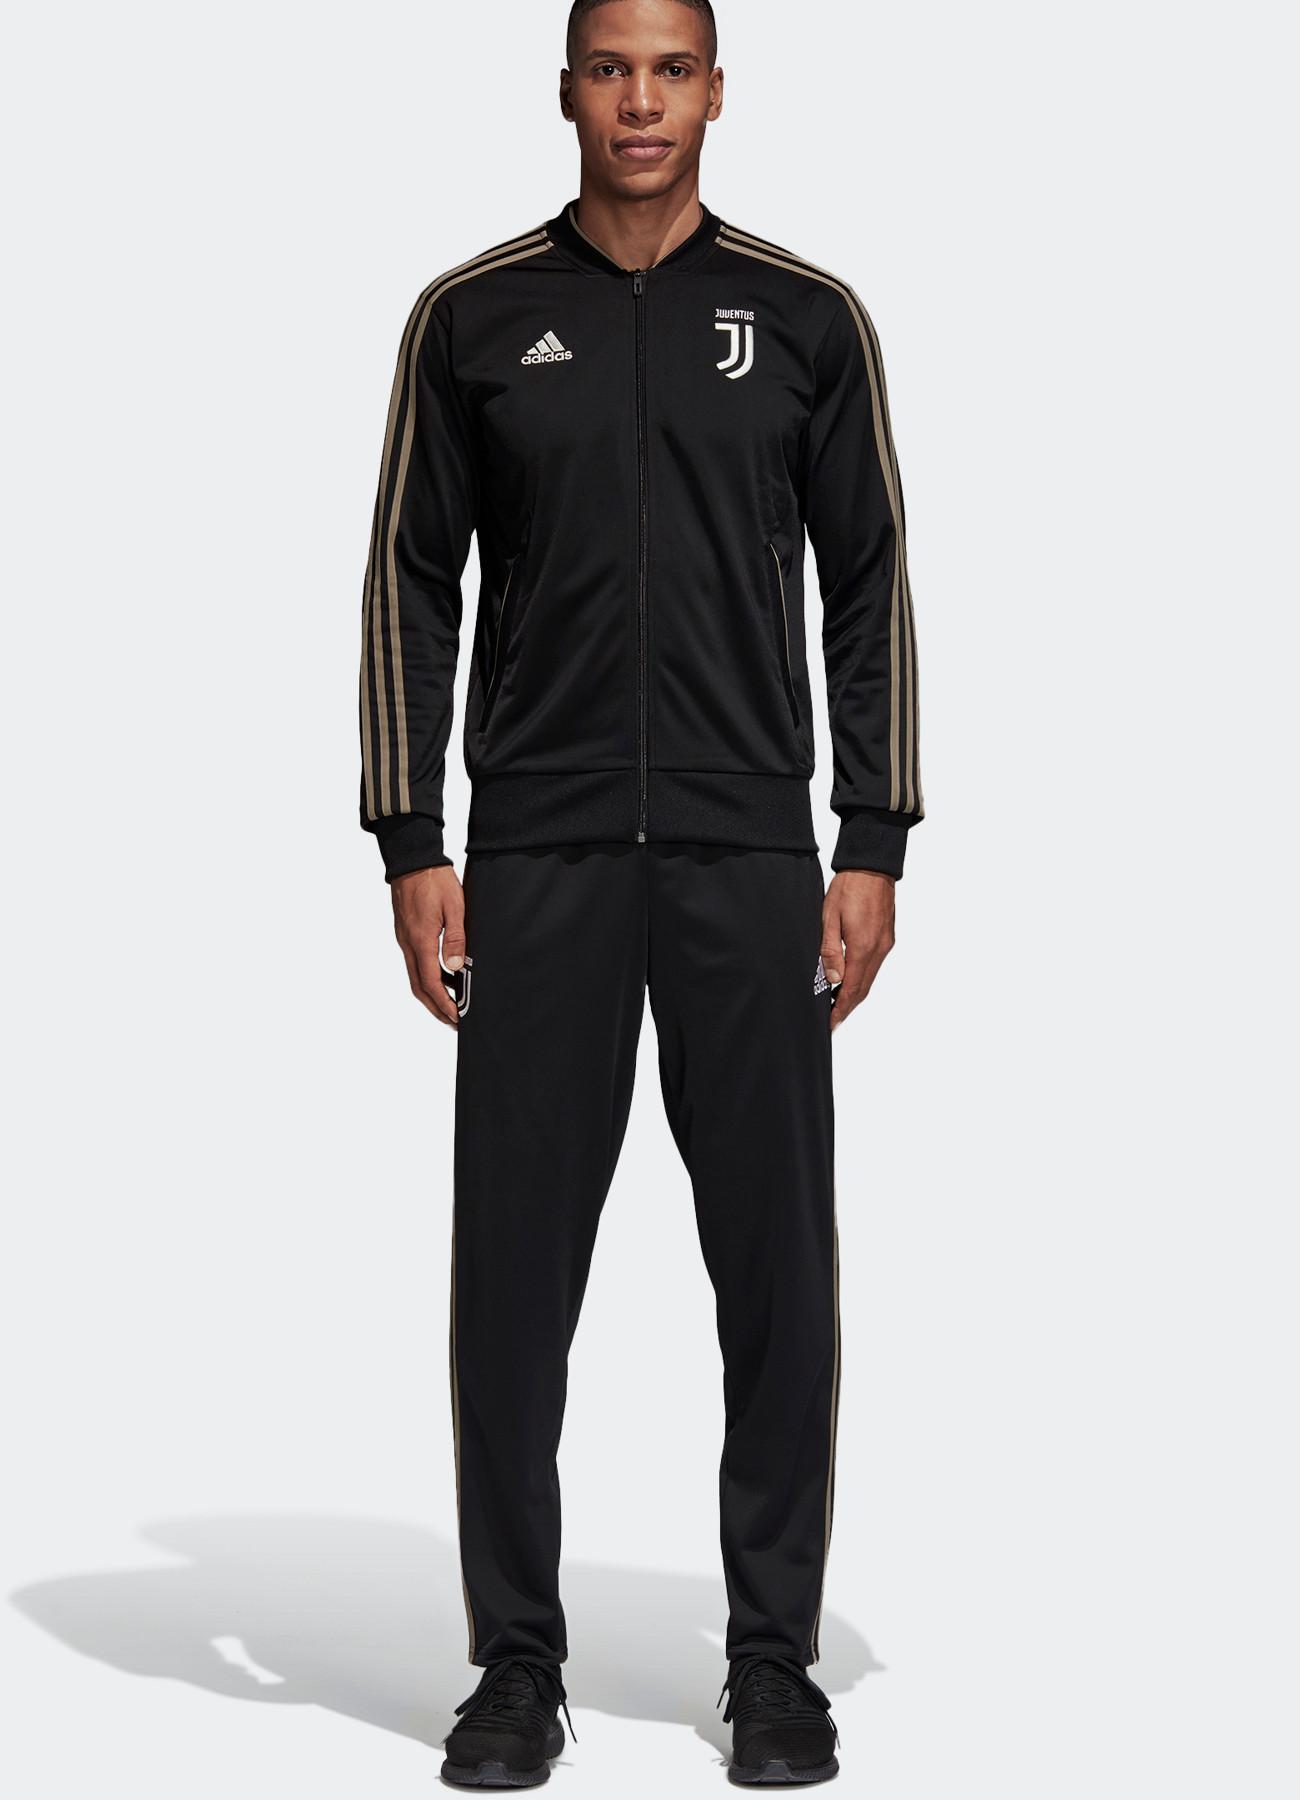 Juventus Turin Adidas Survetement Training 2018 19 19 2018 Pes Bench Version Noir 548de0